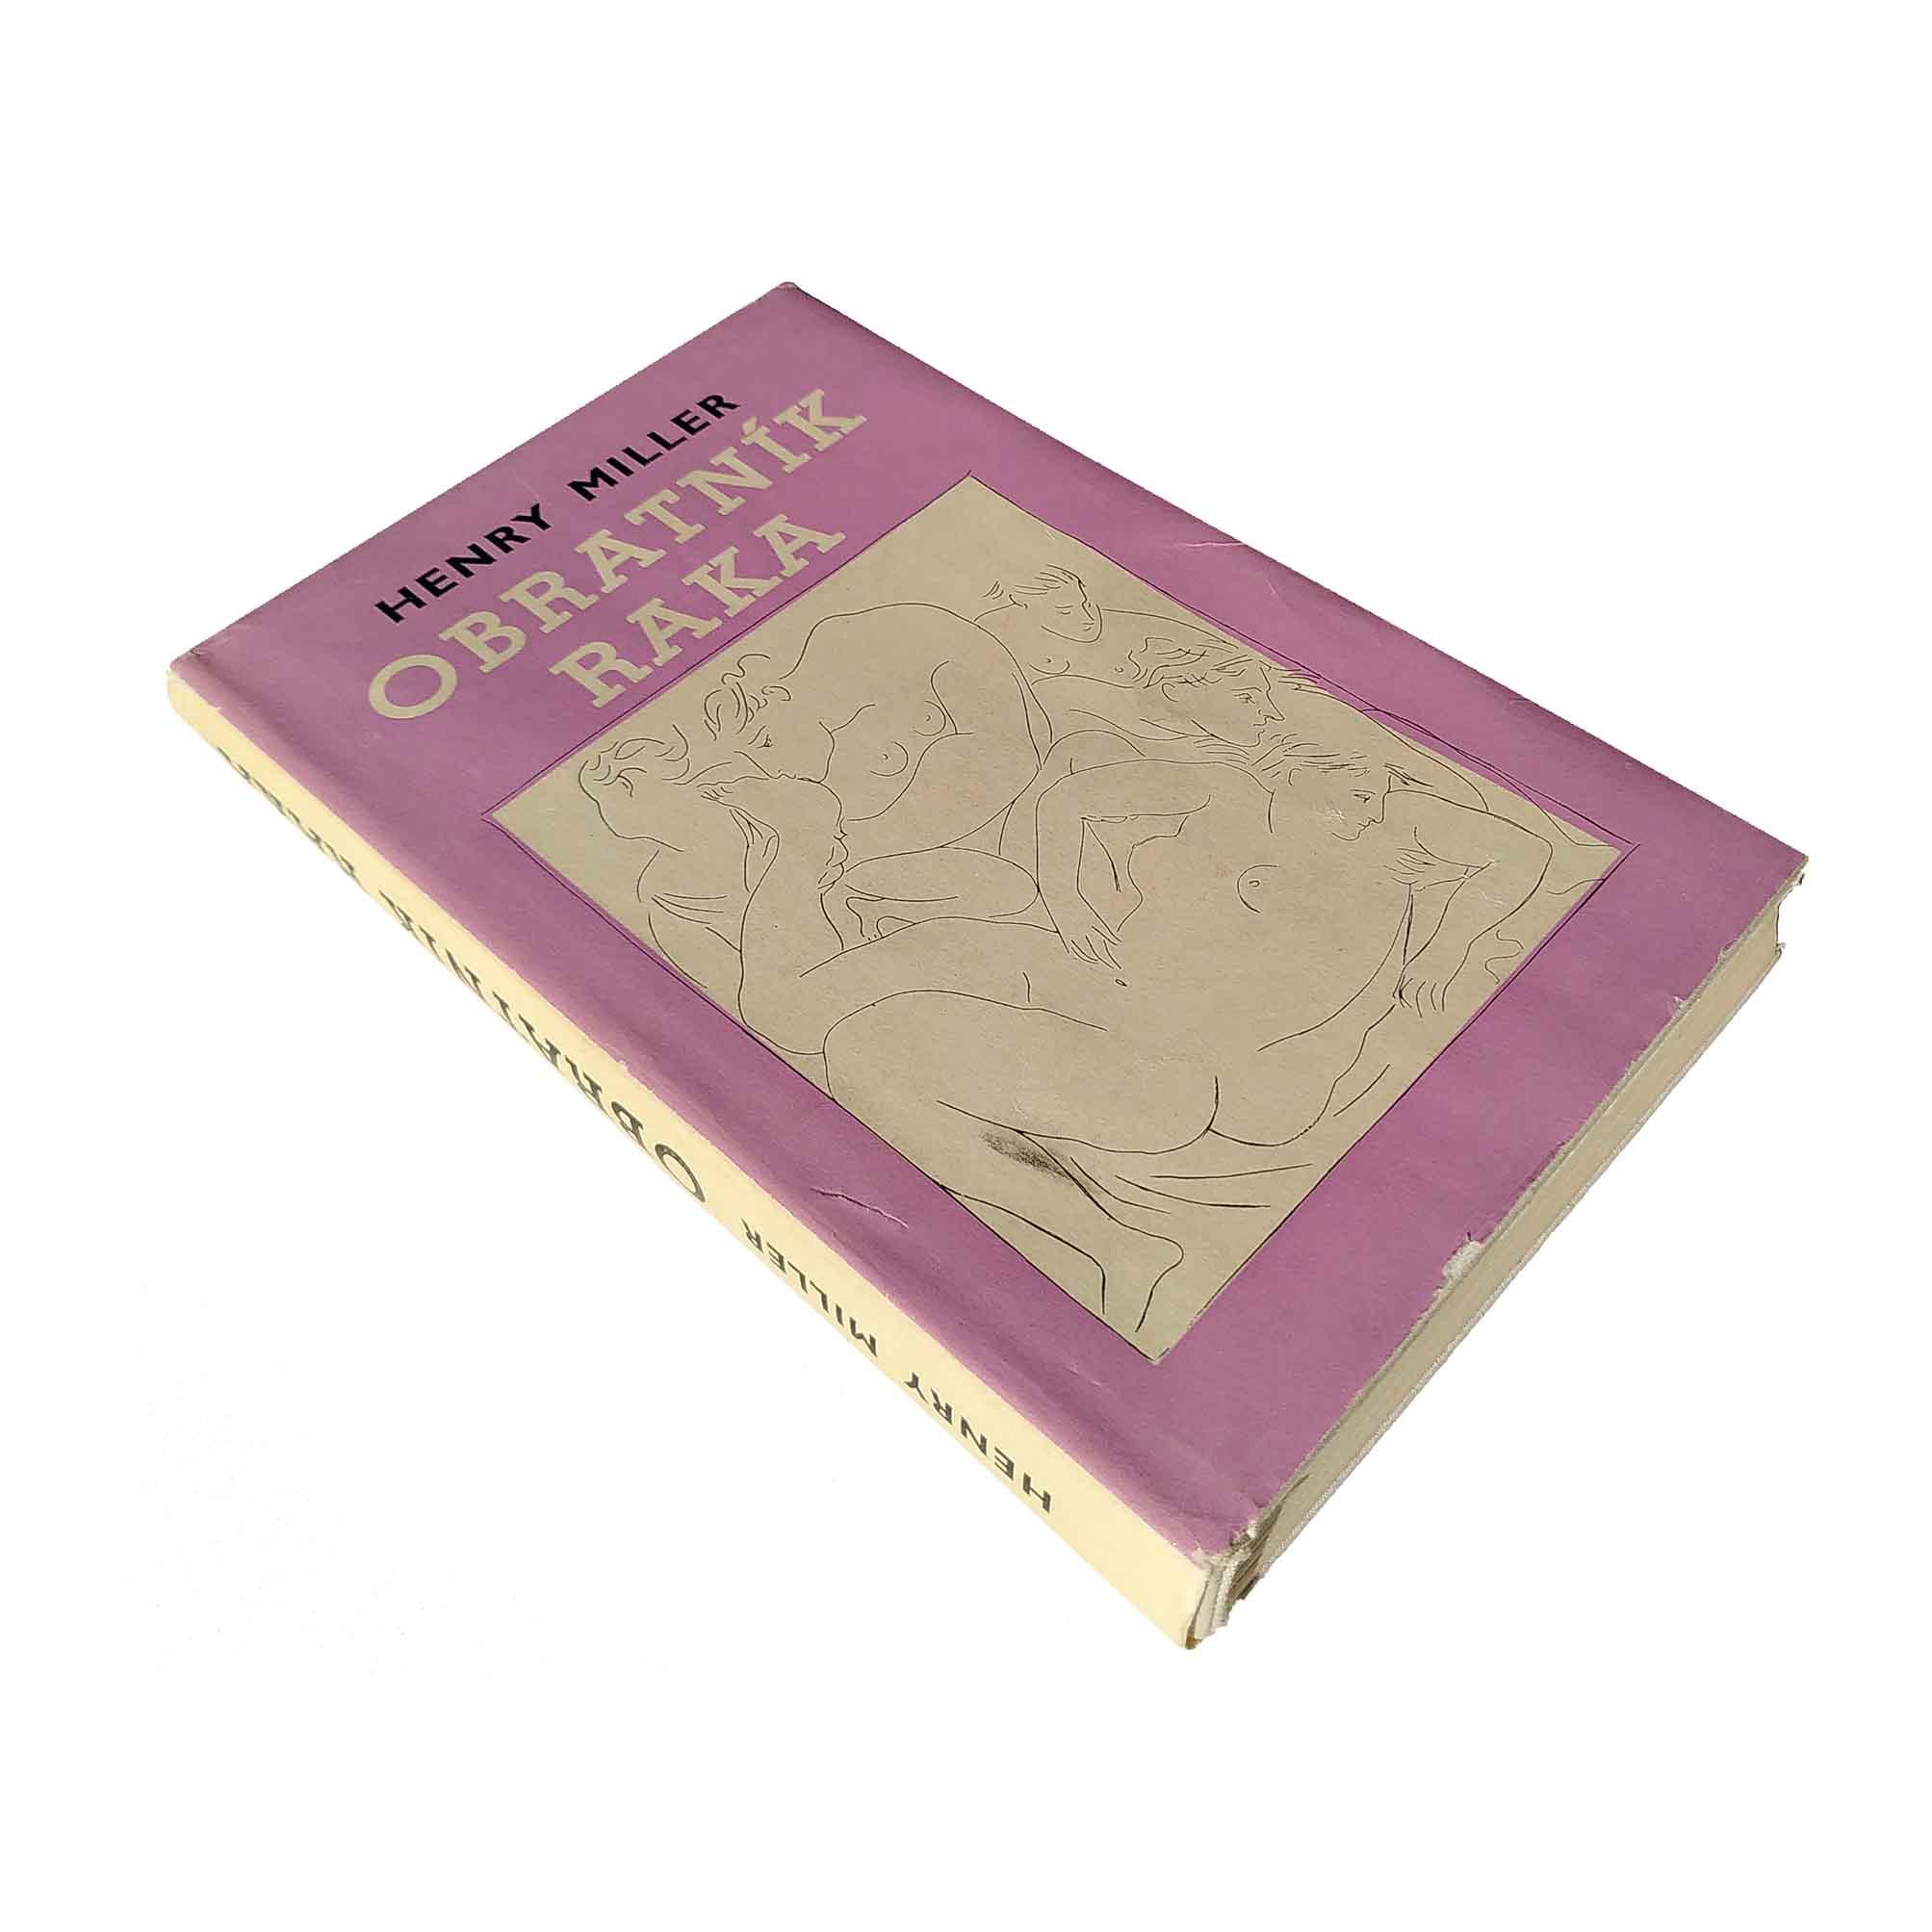 5916-Miller-Cancer-Slovak-First-Edition-1970-Dust-Jacket-free-N.jpg